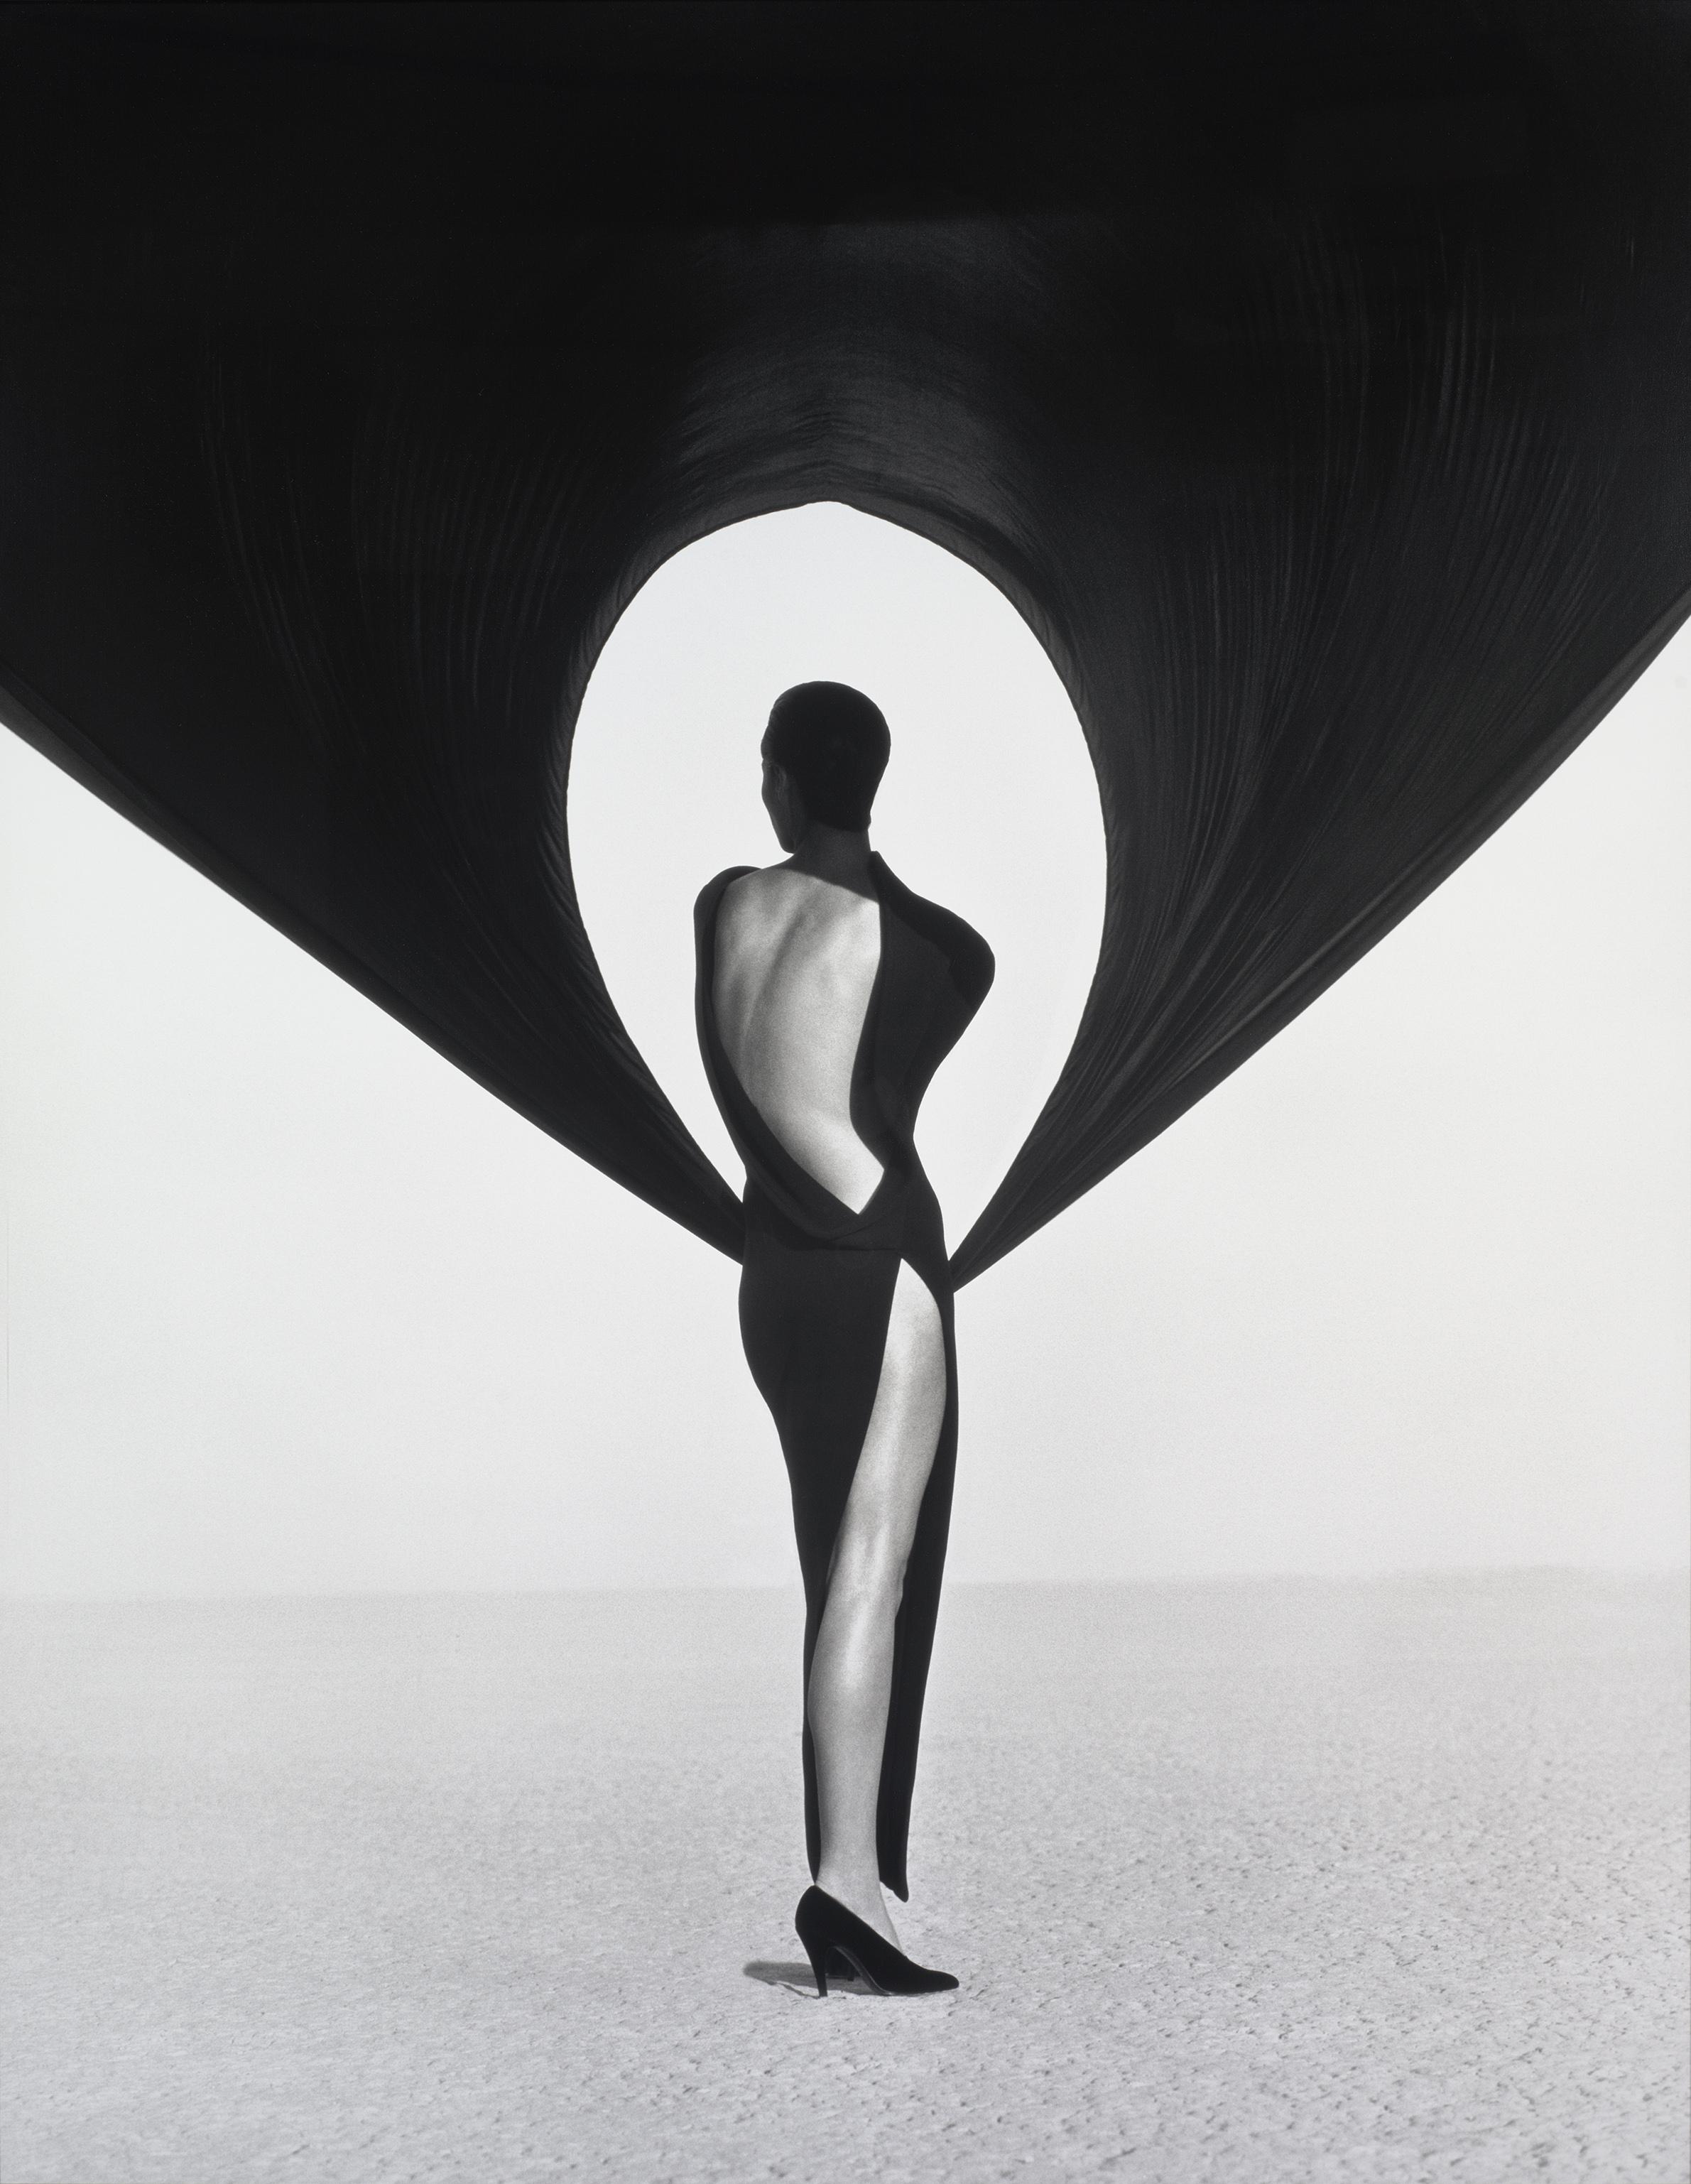 1-versace-dress-back-view-el-mirage-1990.jpg